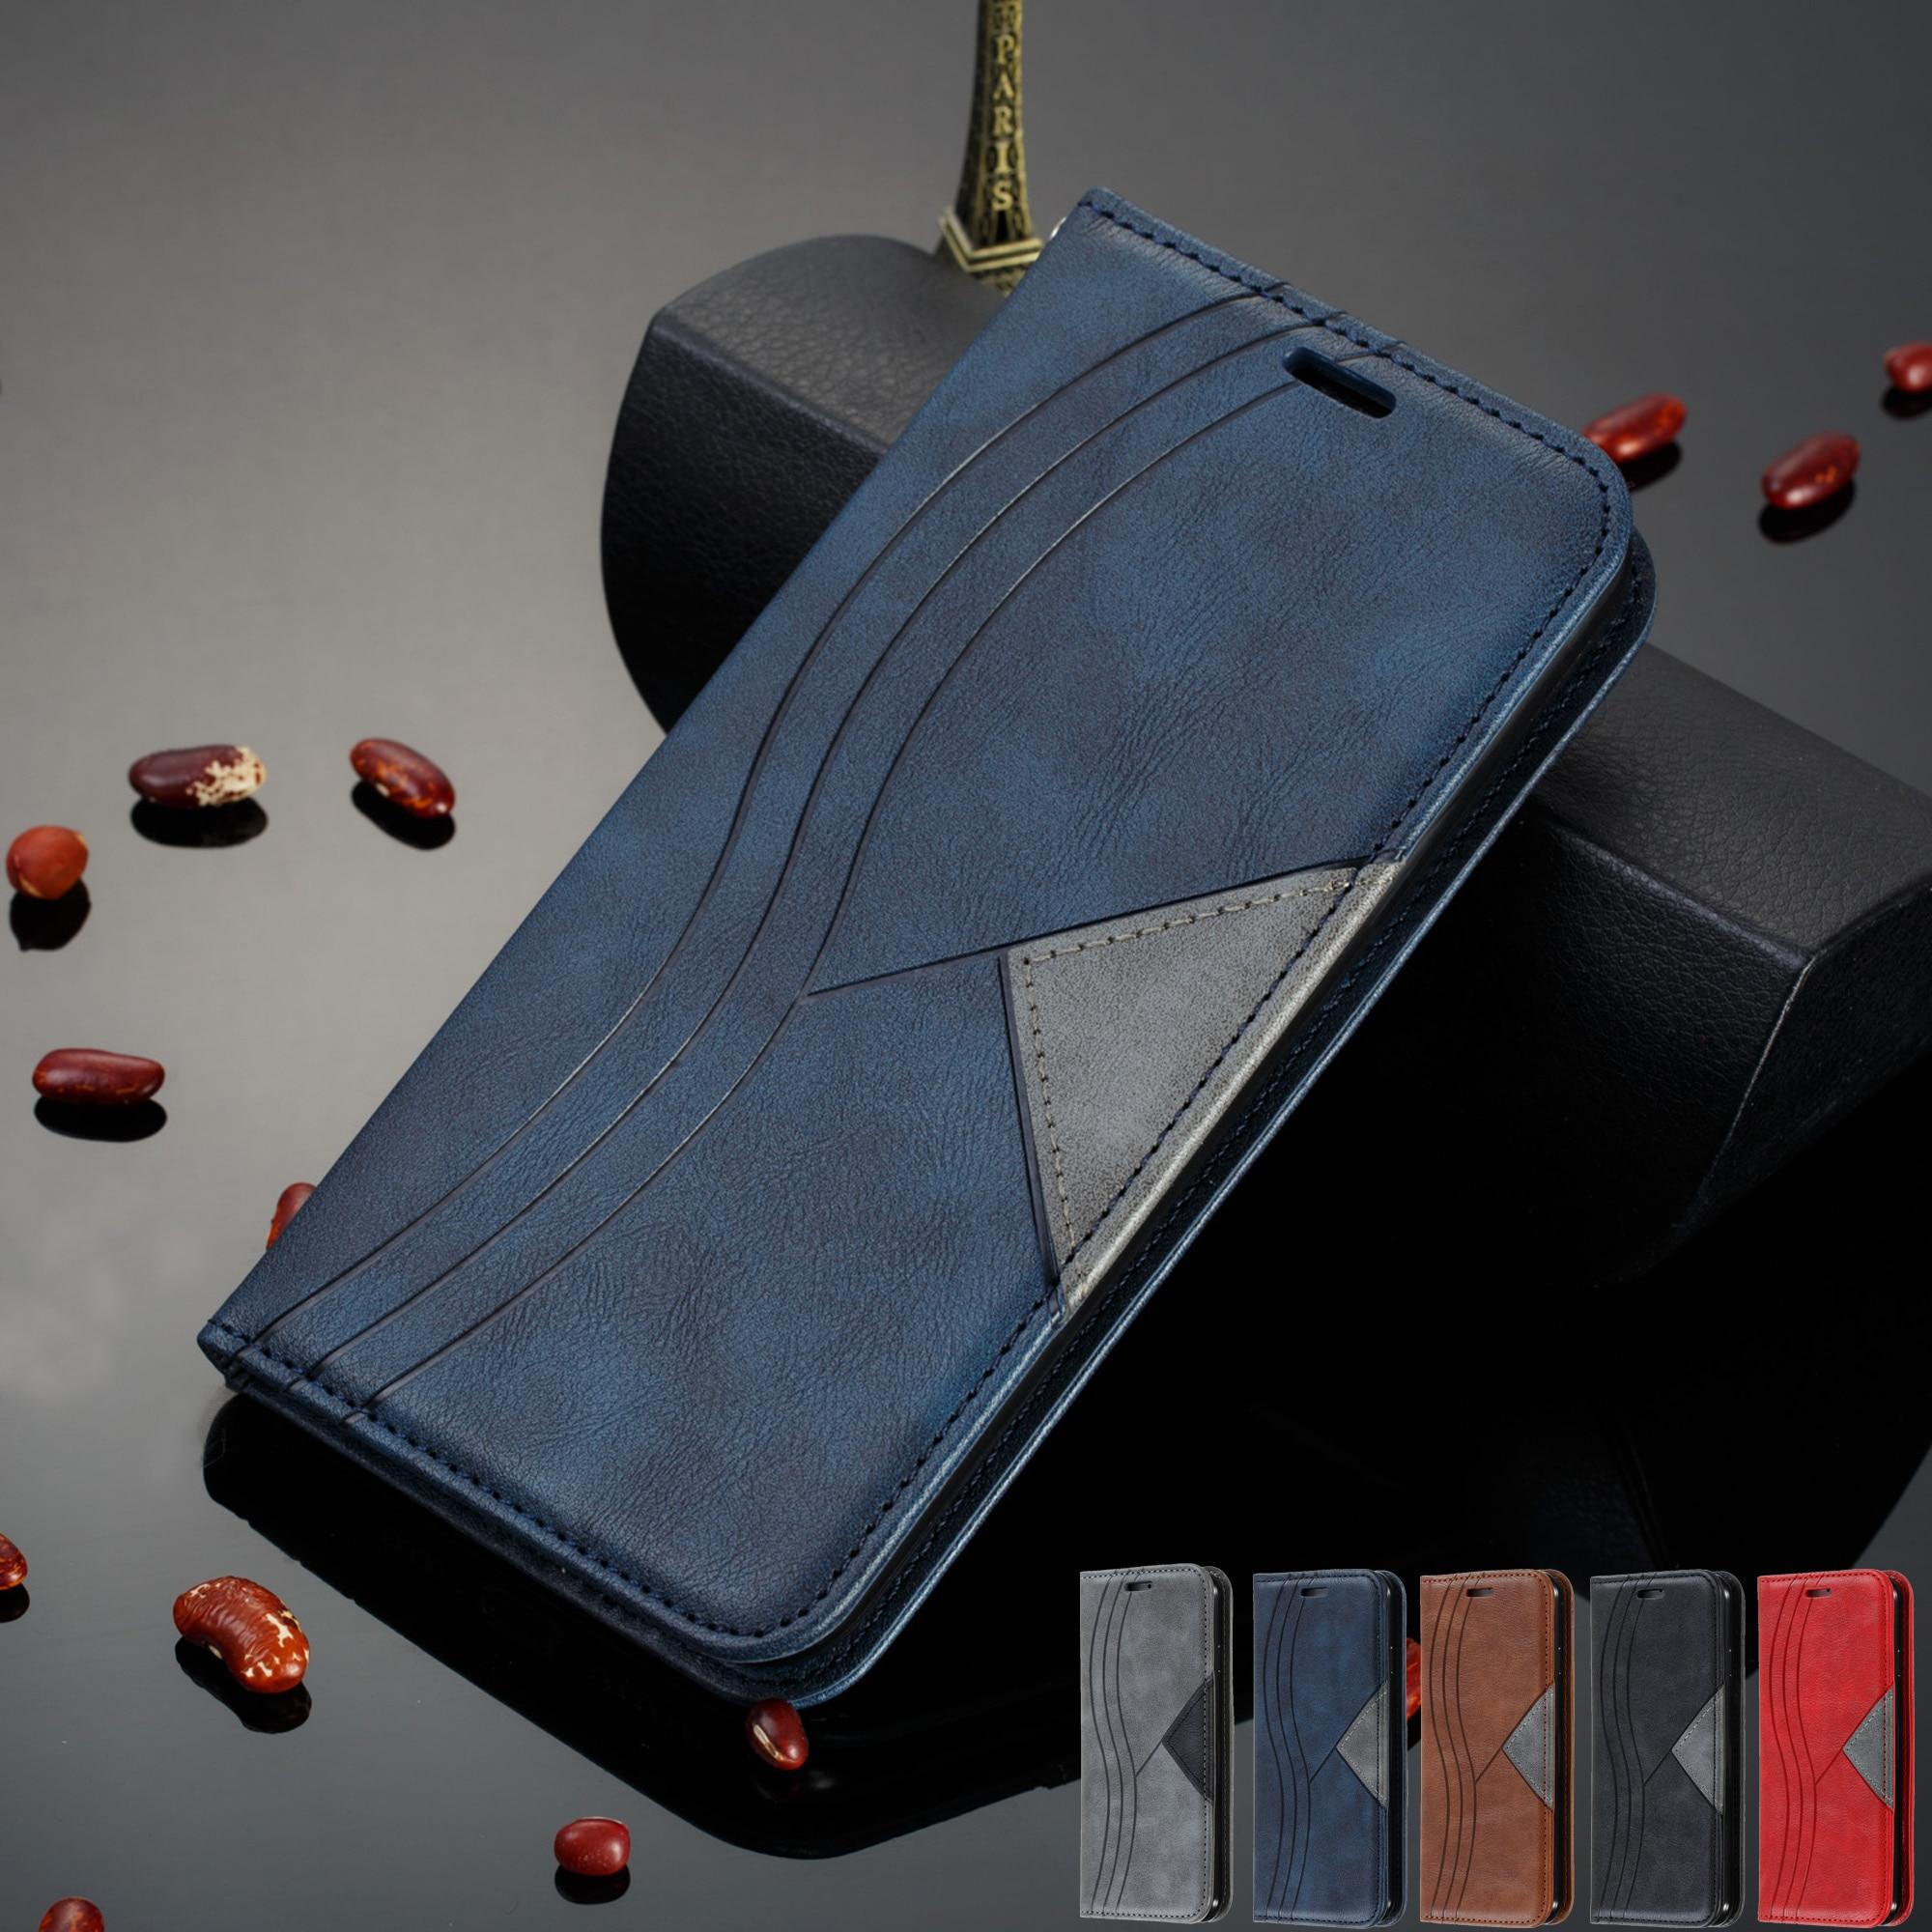 Capa de telefone para etui xiaomi redmi 8 redmi 8 caso da aleta ímã de couro para capa xiaomi xiomi redmi 7 6 redmi 7 redmi 6 caso carteira